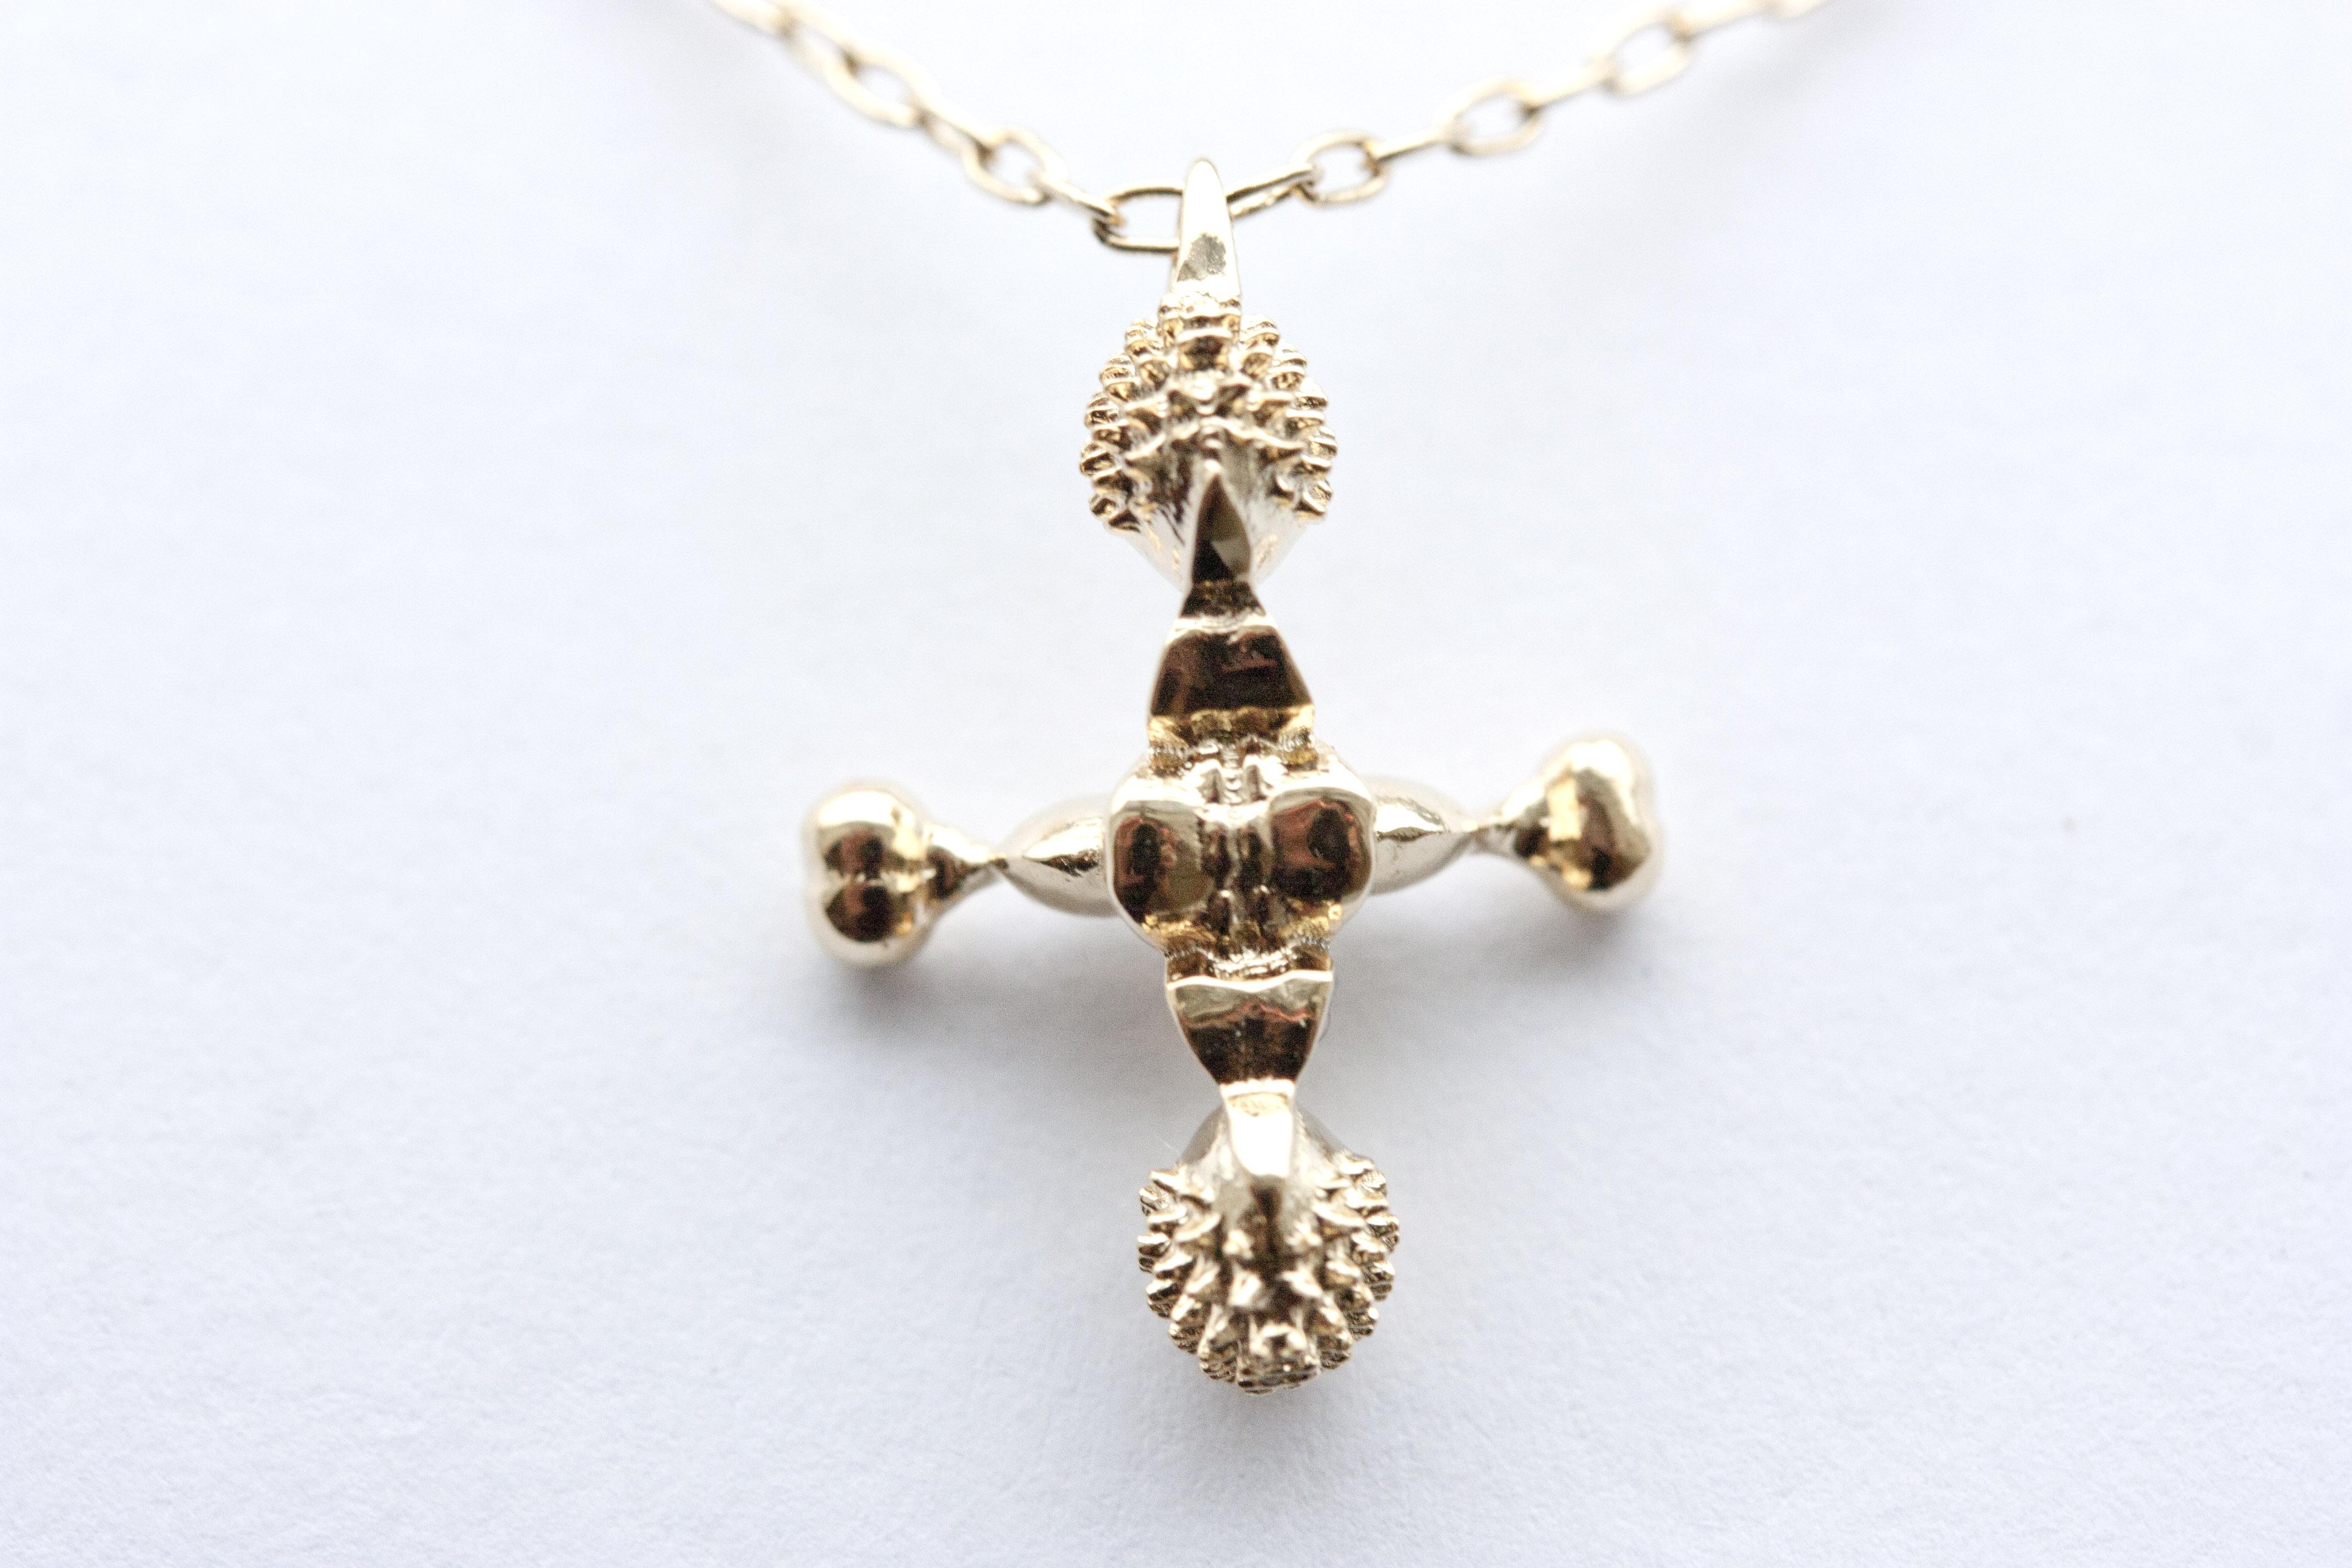 TIN01 / Gold / Silver / Jewelry